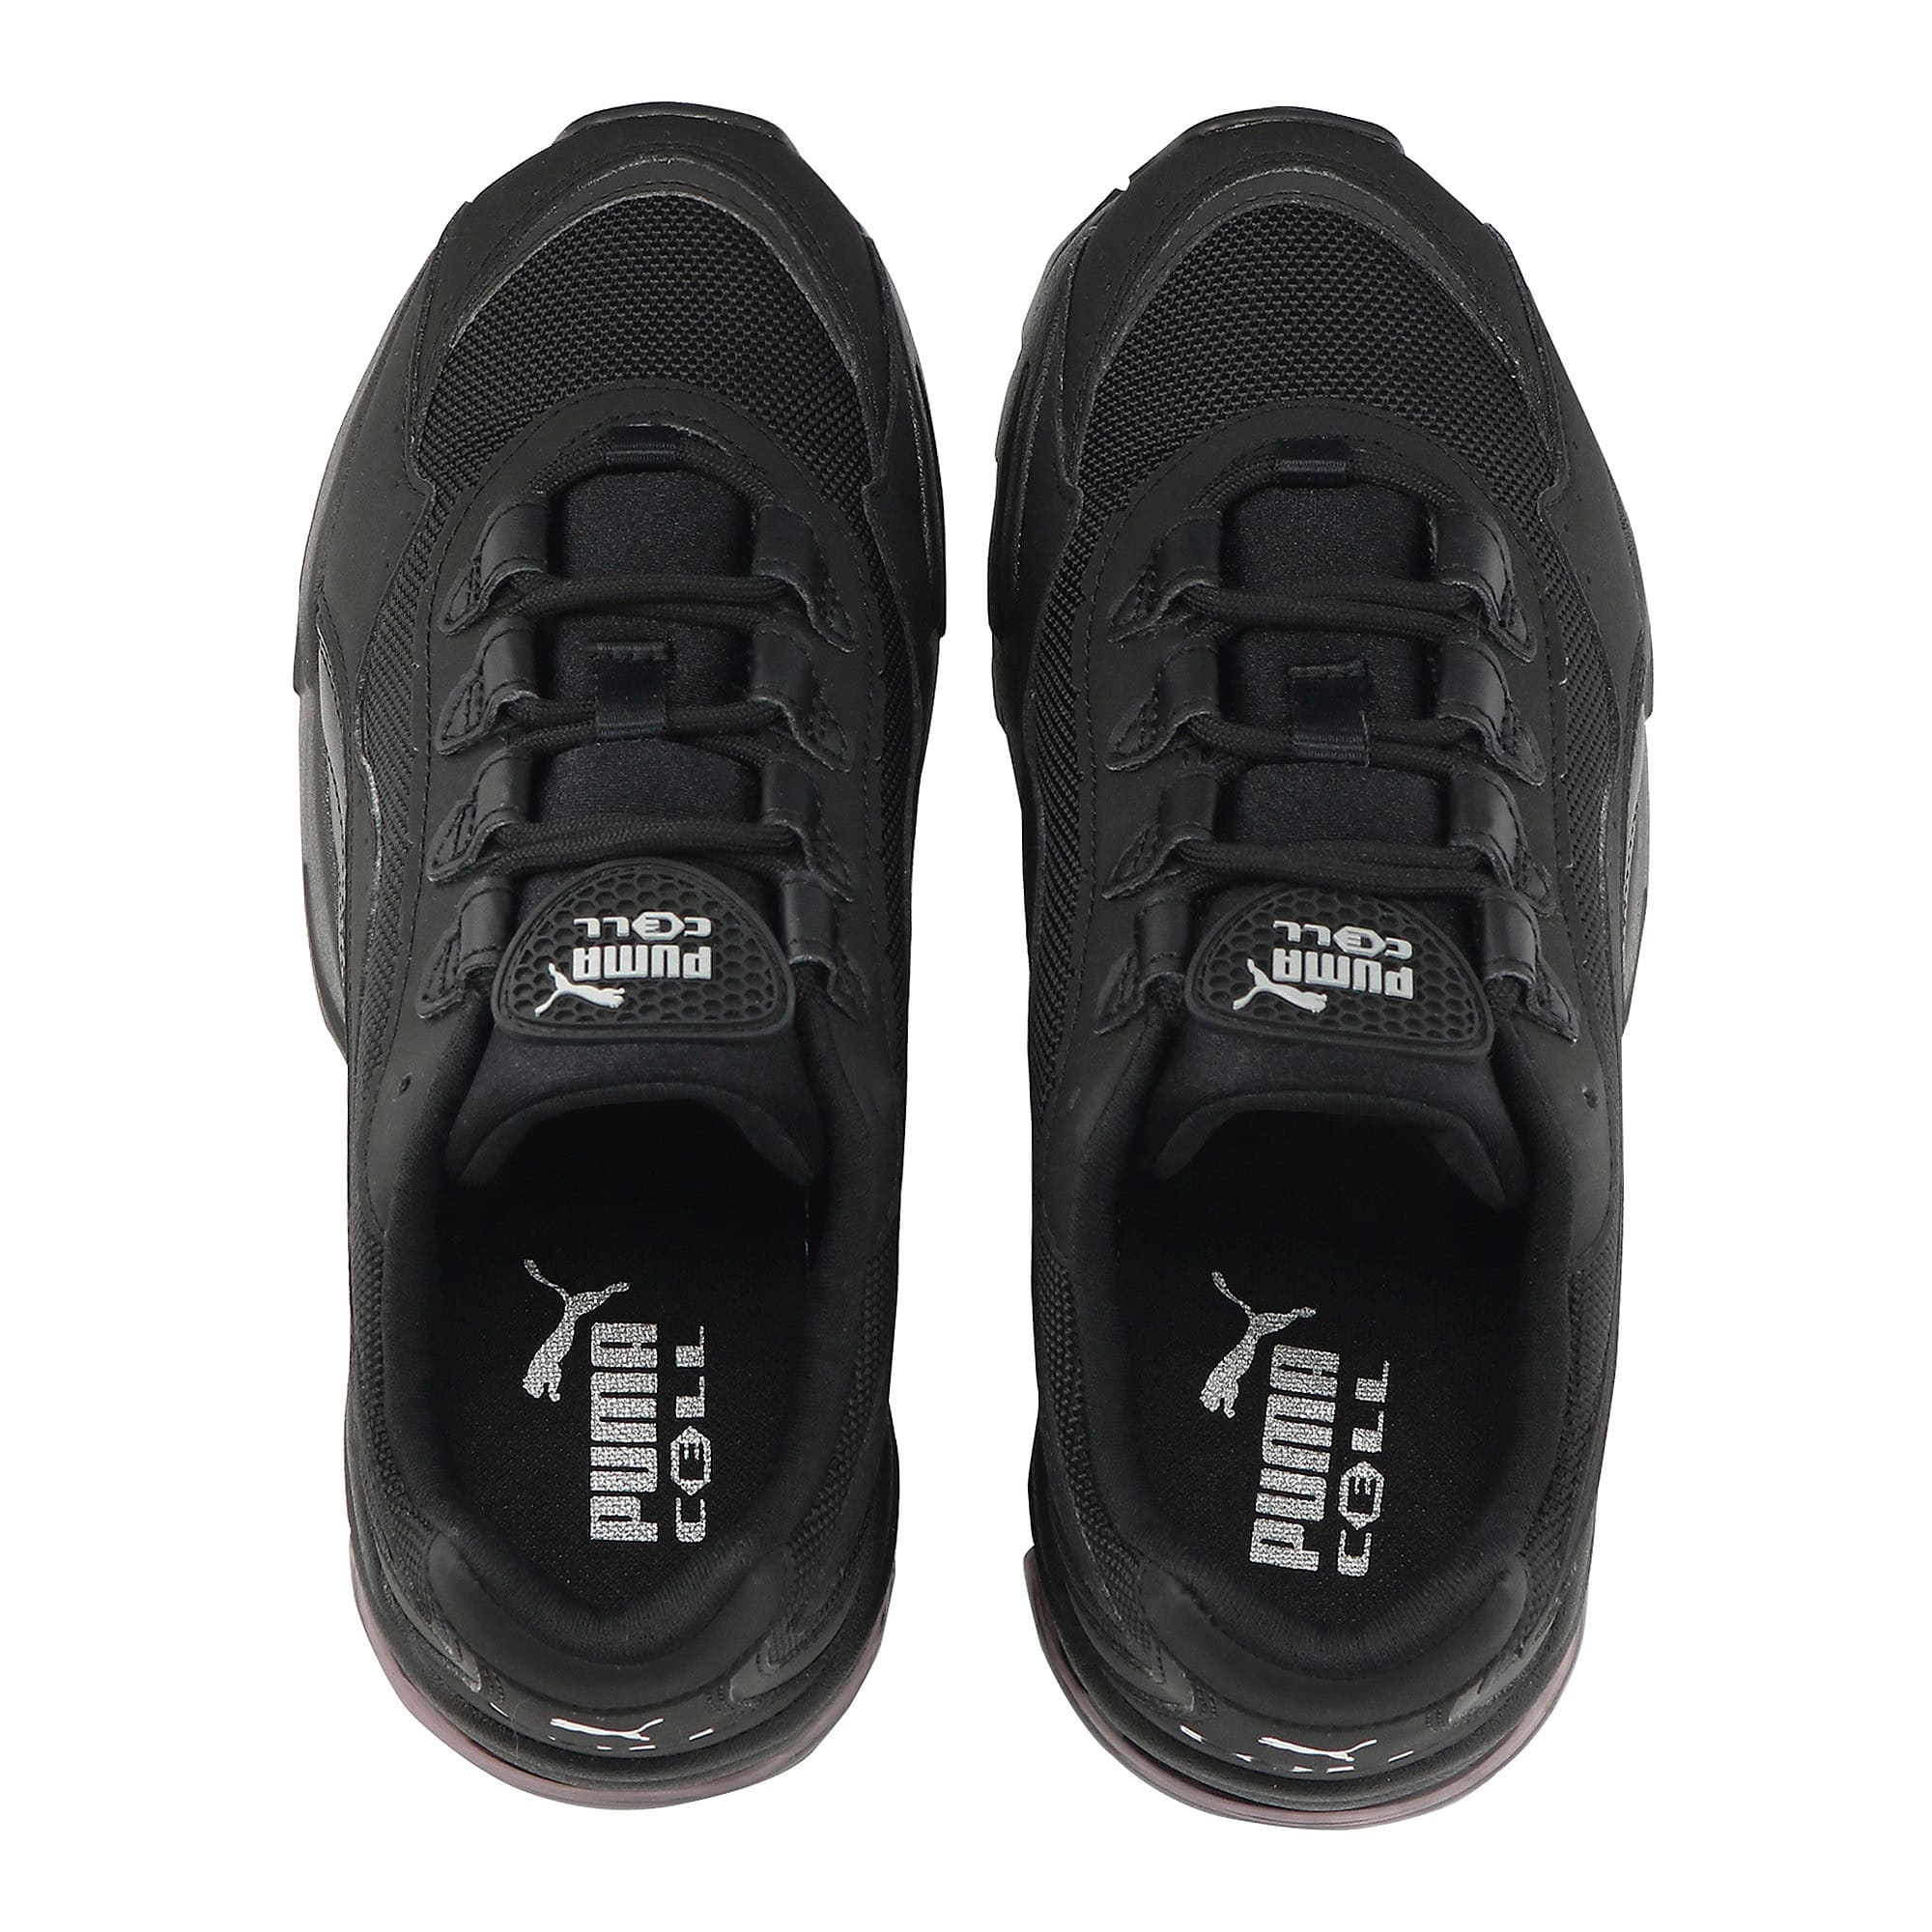 Thumbnail 6 of CELL Stellar Women's Sneakers, Puma Black-Silver, medium